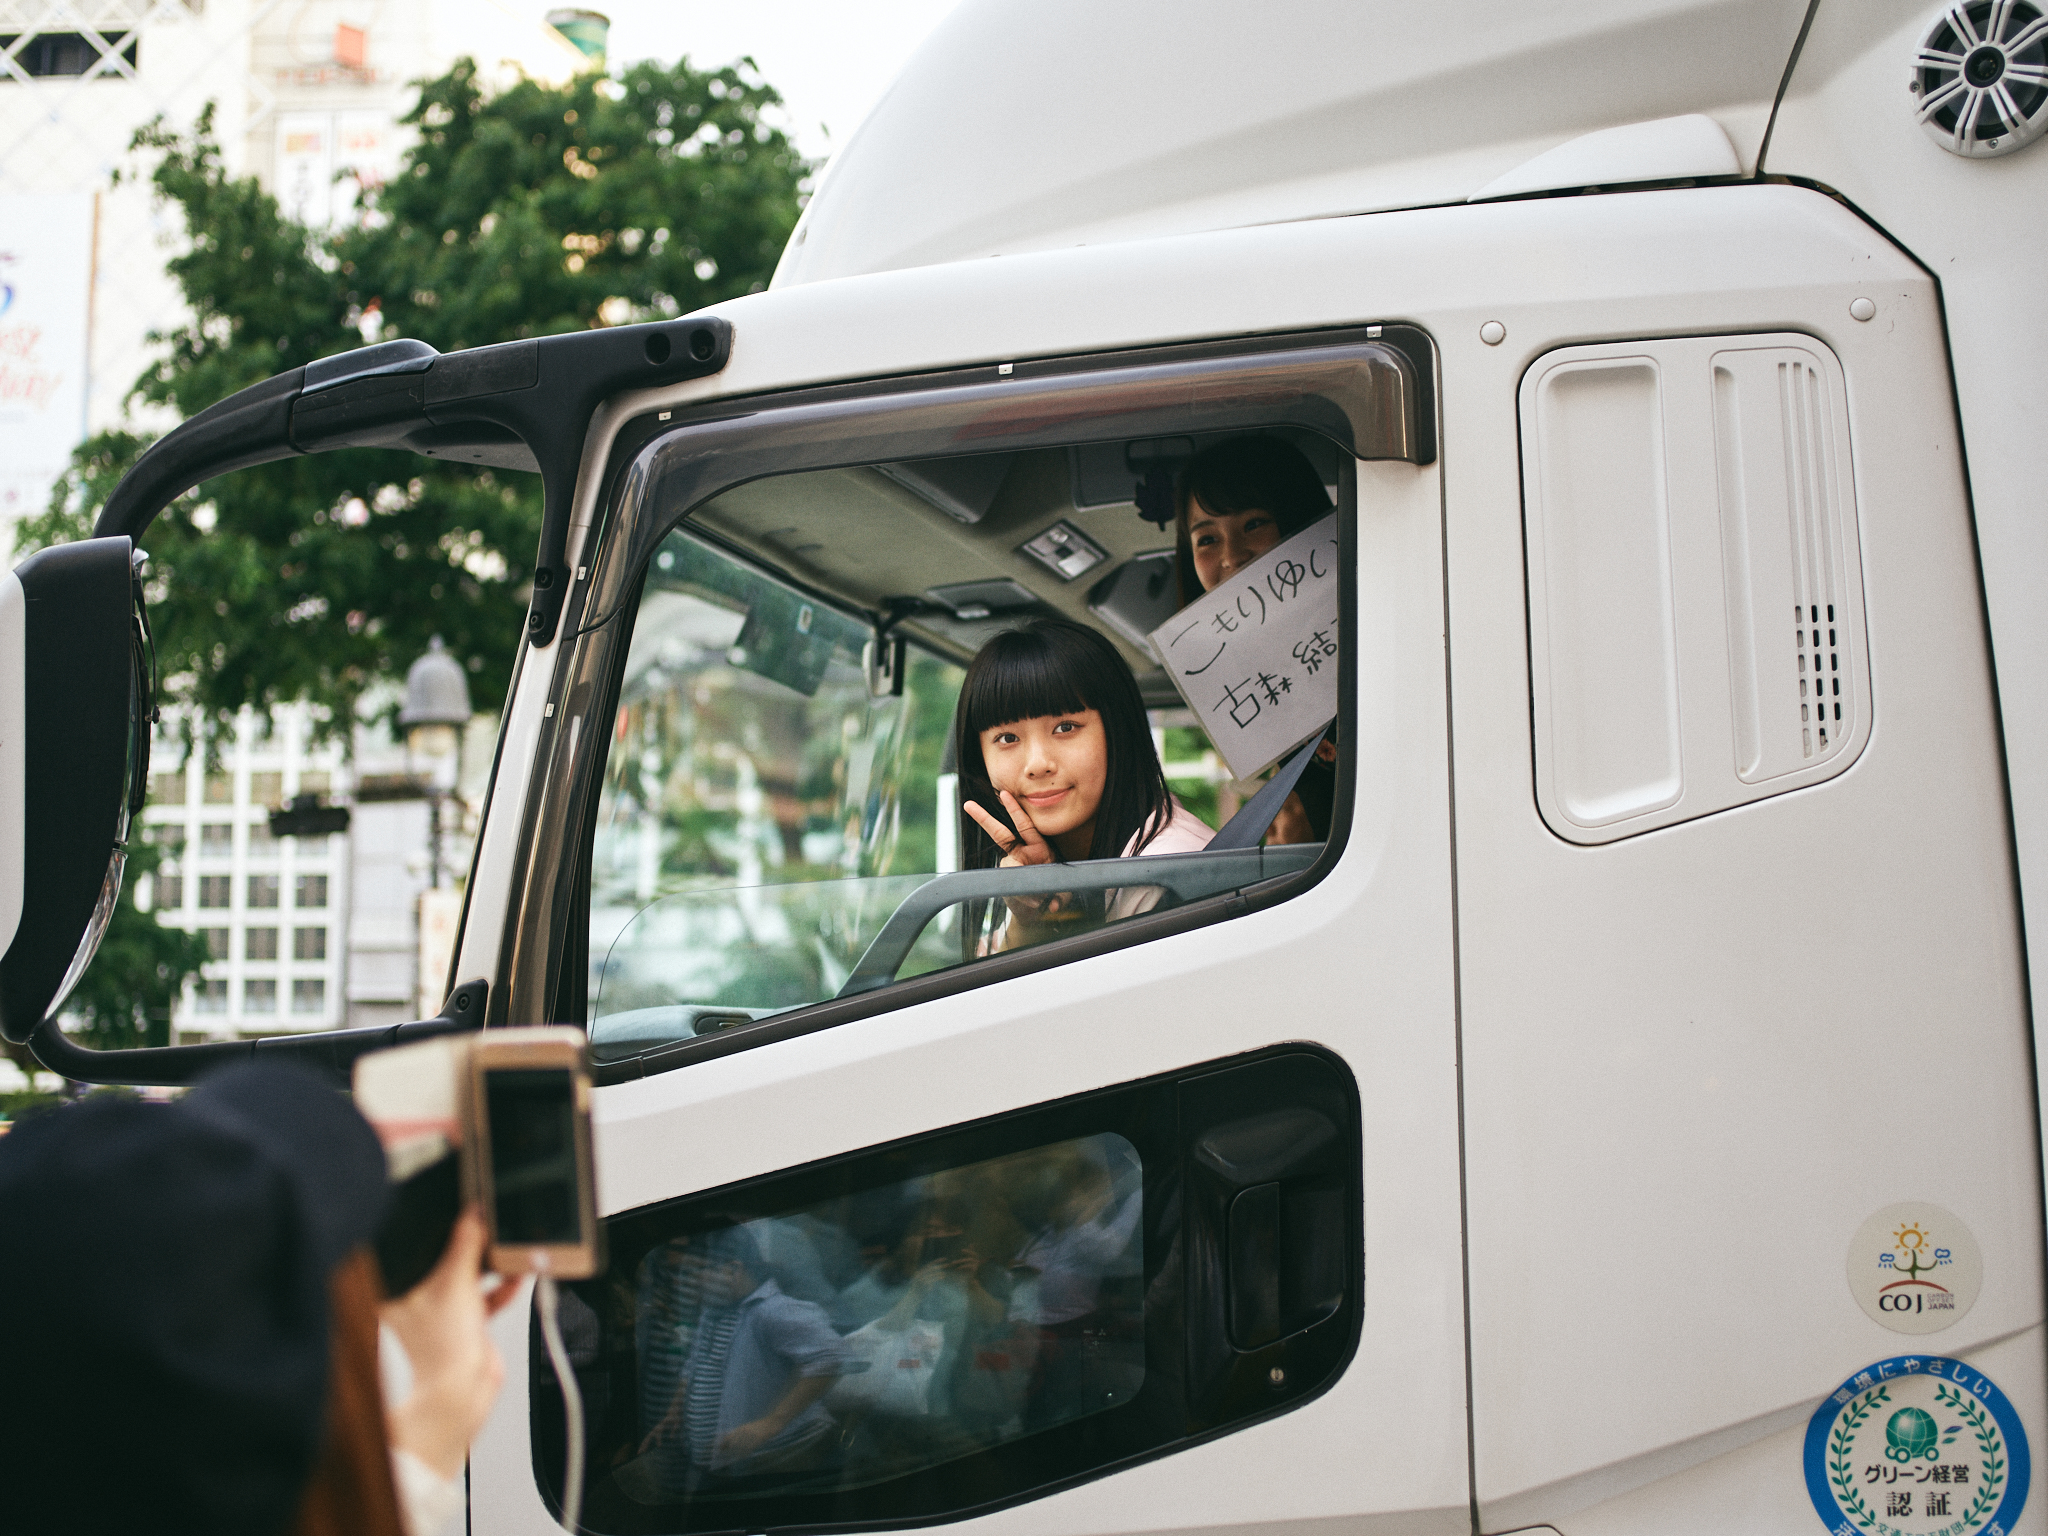 Tokyo street photography guide, idols